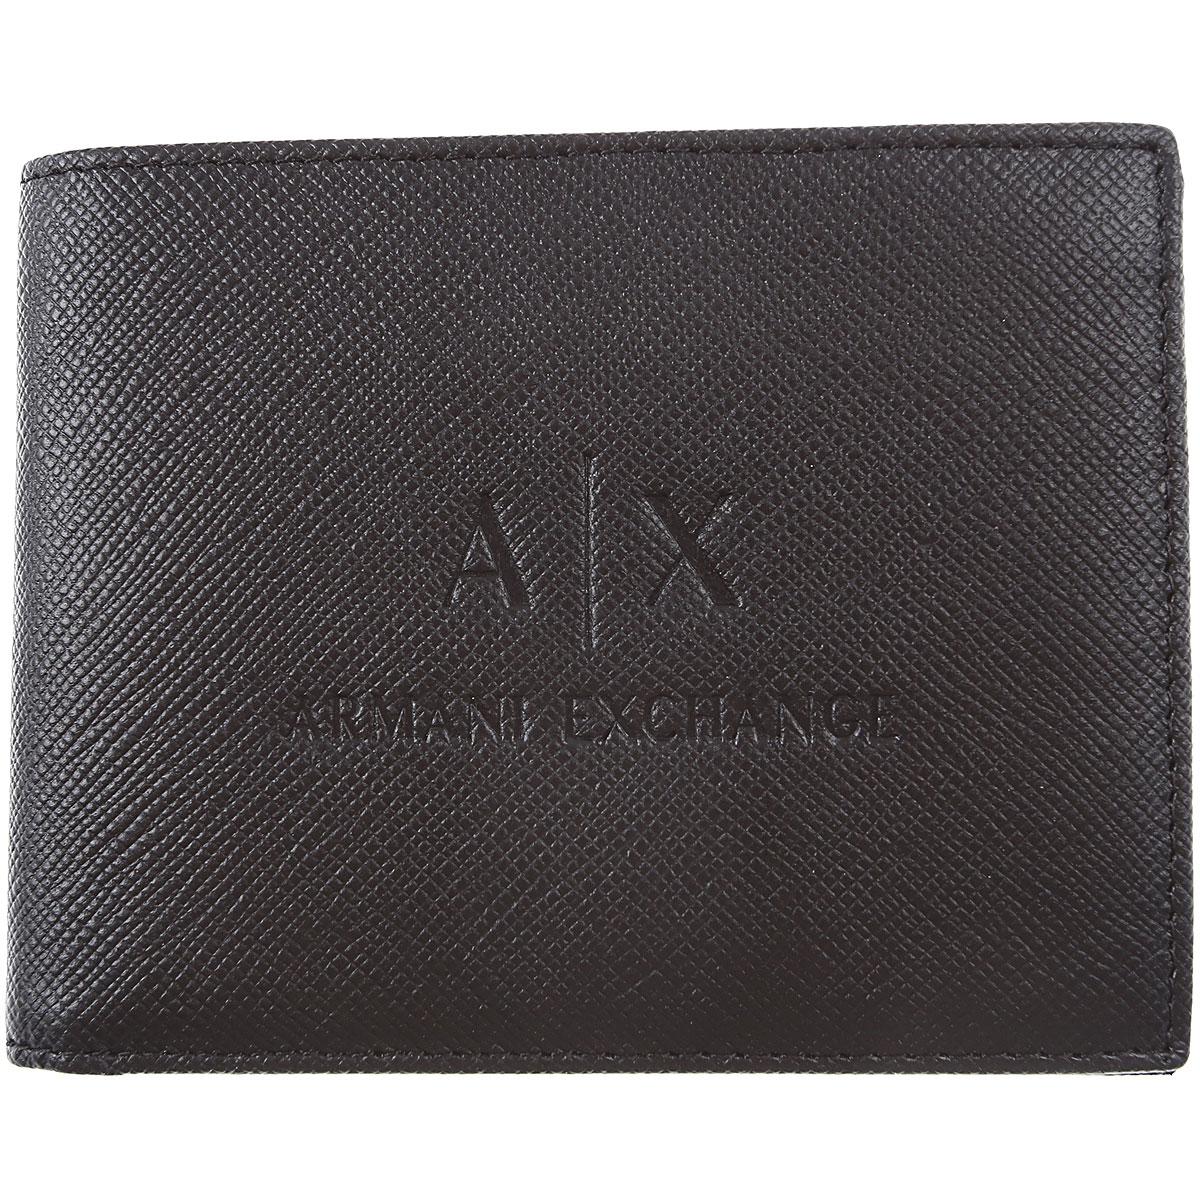 Armani Exchange Wallet for Men On Sale, Black, Saffiano Leather, 2019